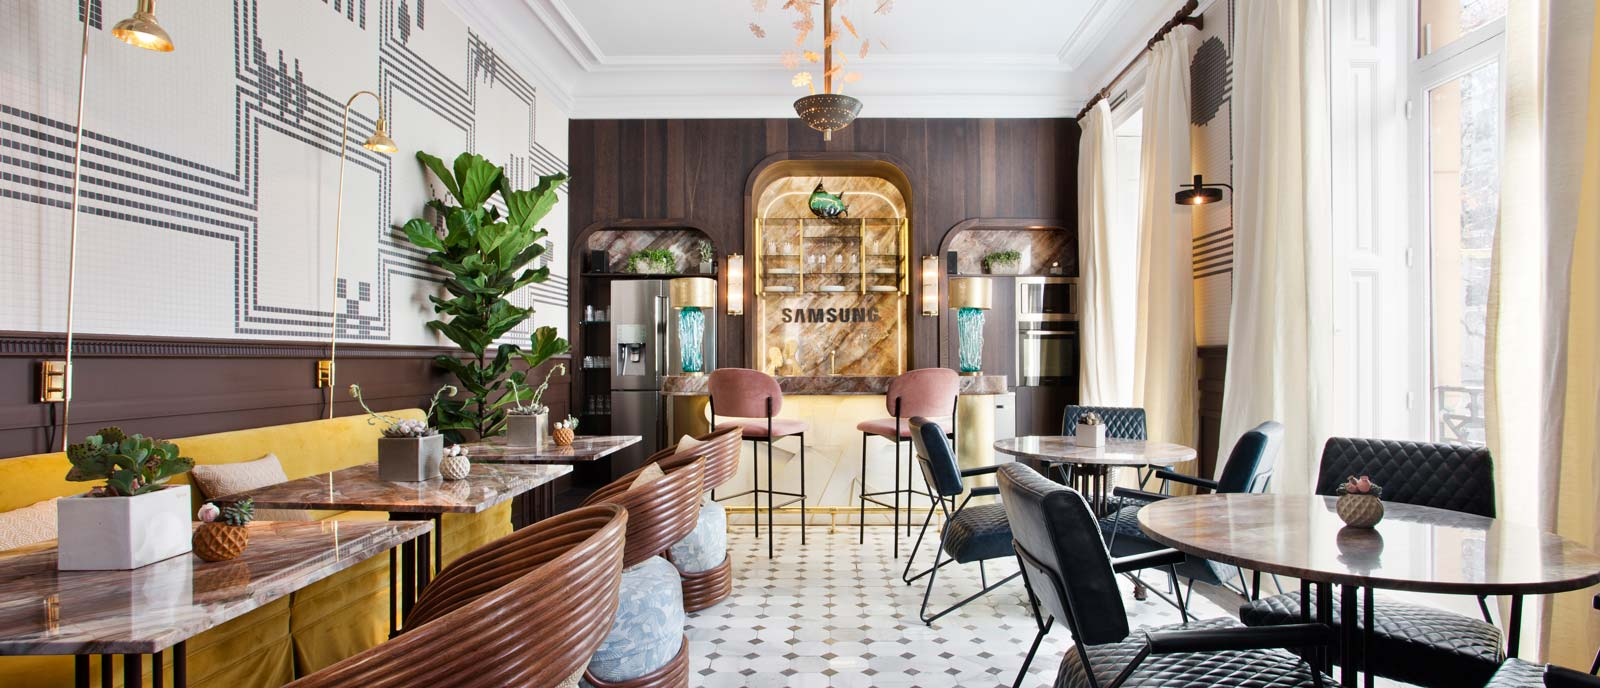 "Restaurante ""Samsung Club"" – Espacio Samsung"